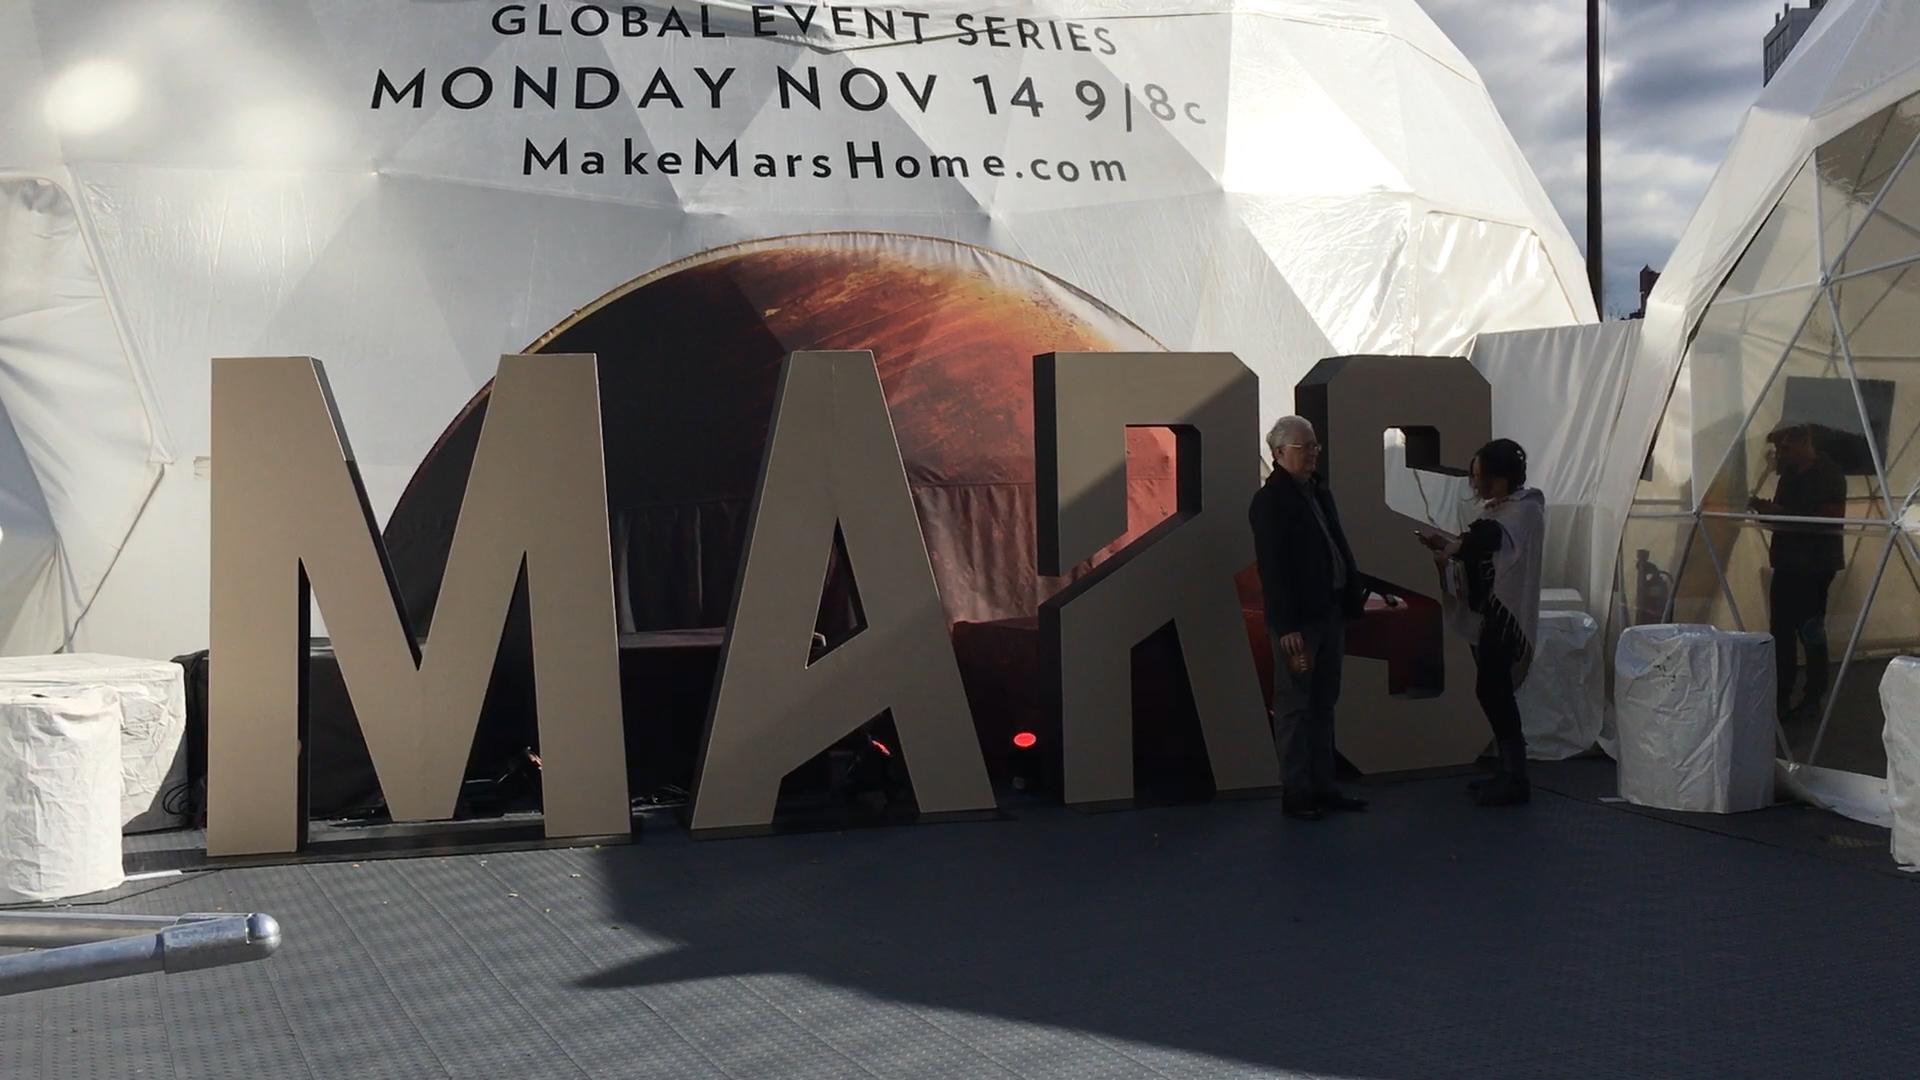 NAT GEO MAKE MARS HOME EVENT